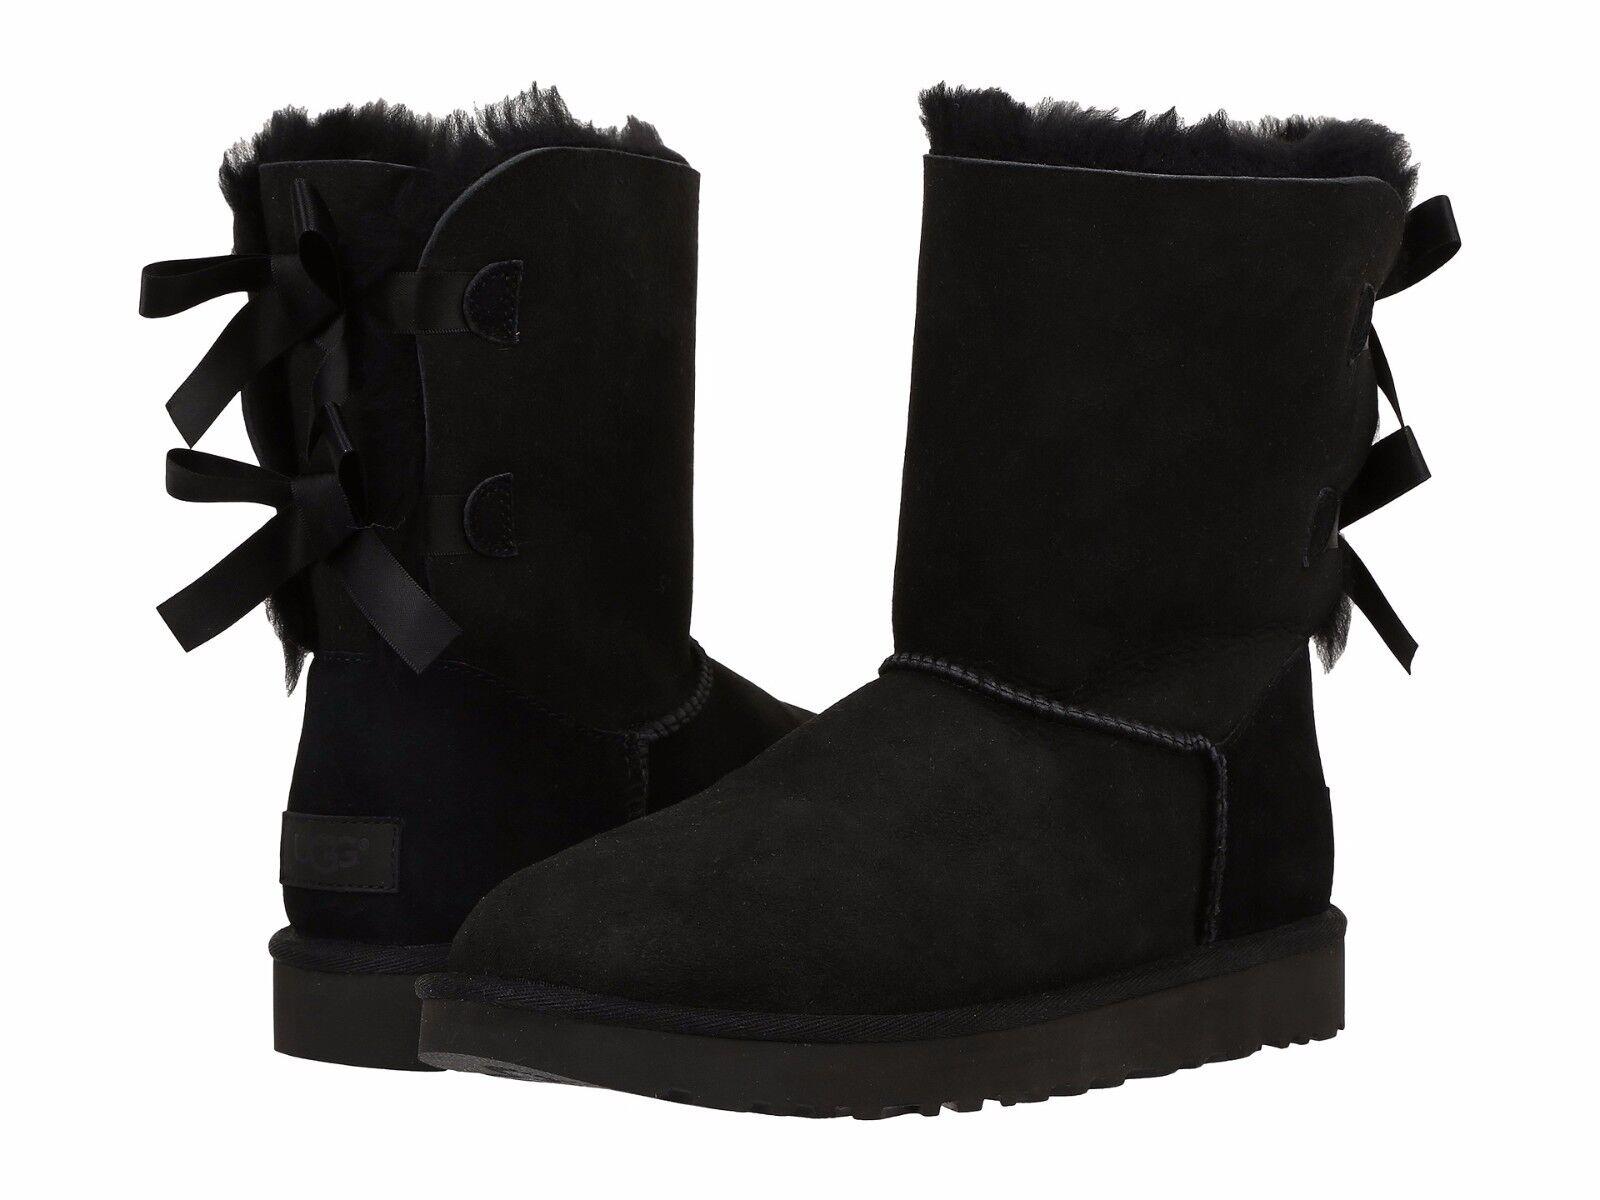 Női cipő UGG Bailey Bow II Boot 1016225 Fekete 5 6 7 8 9 10 11 * Új *